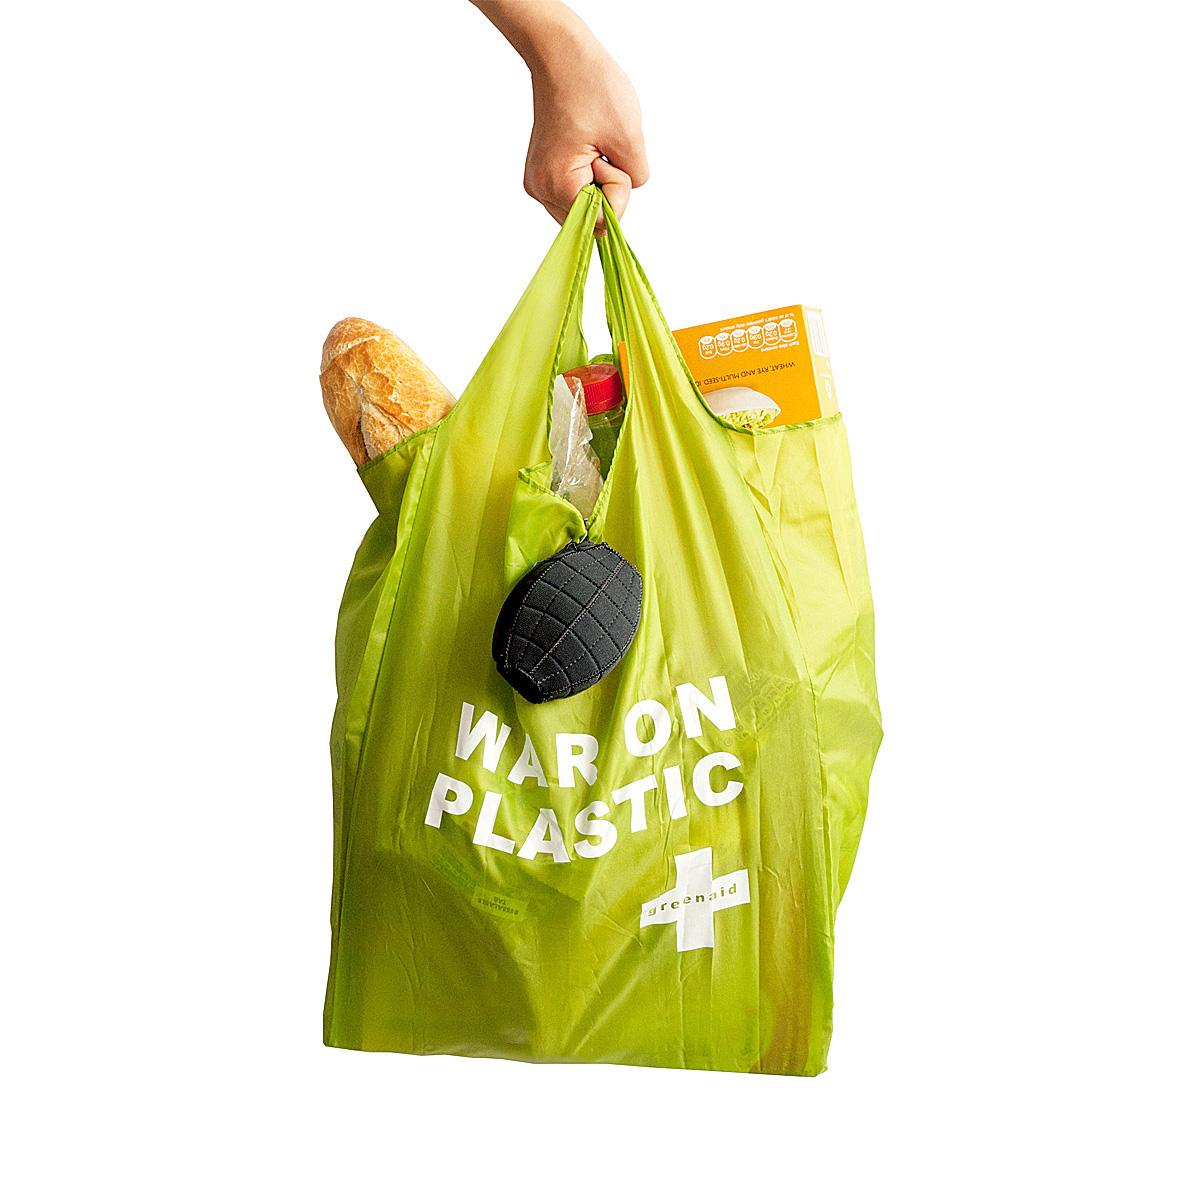 War on plastic bag